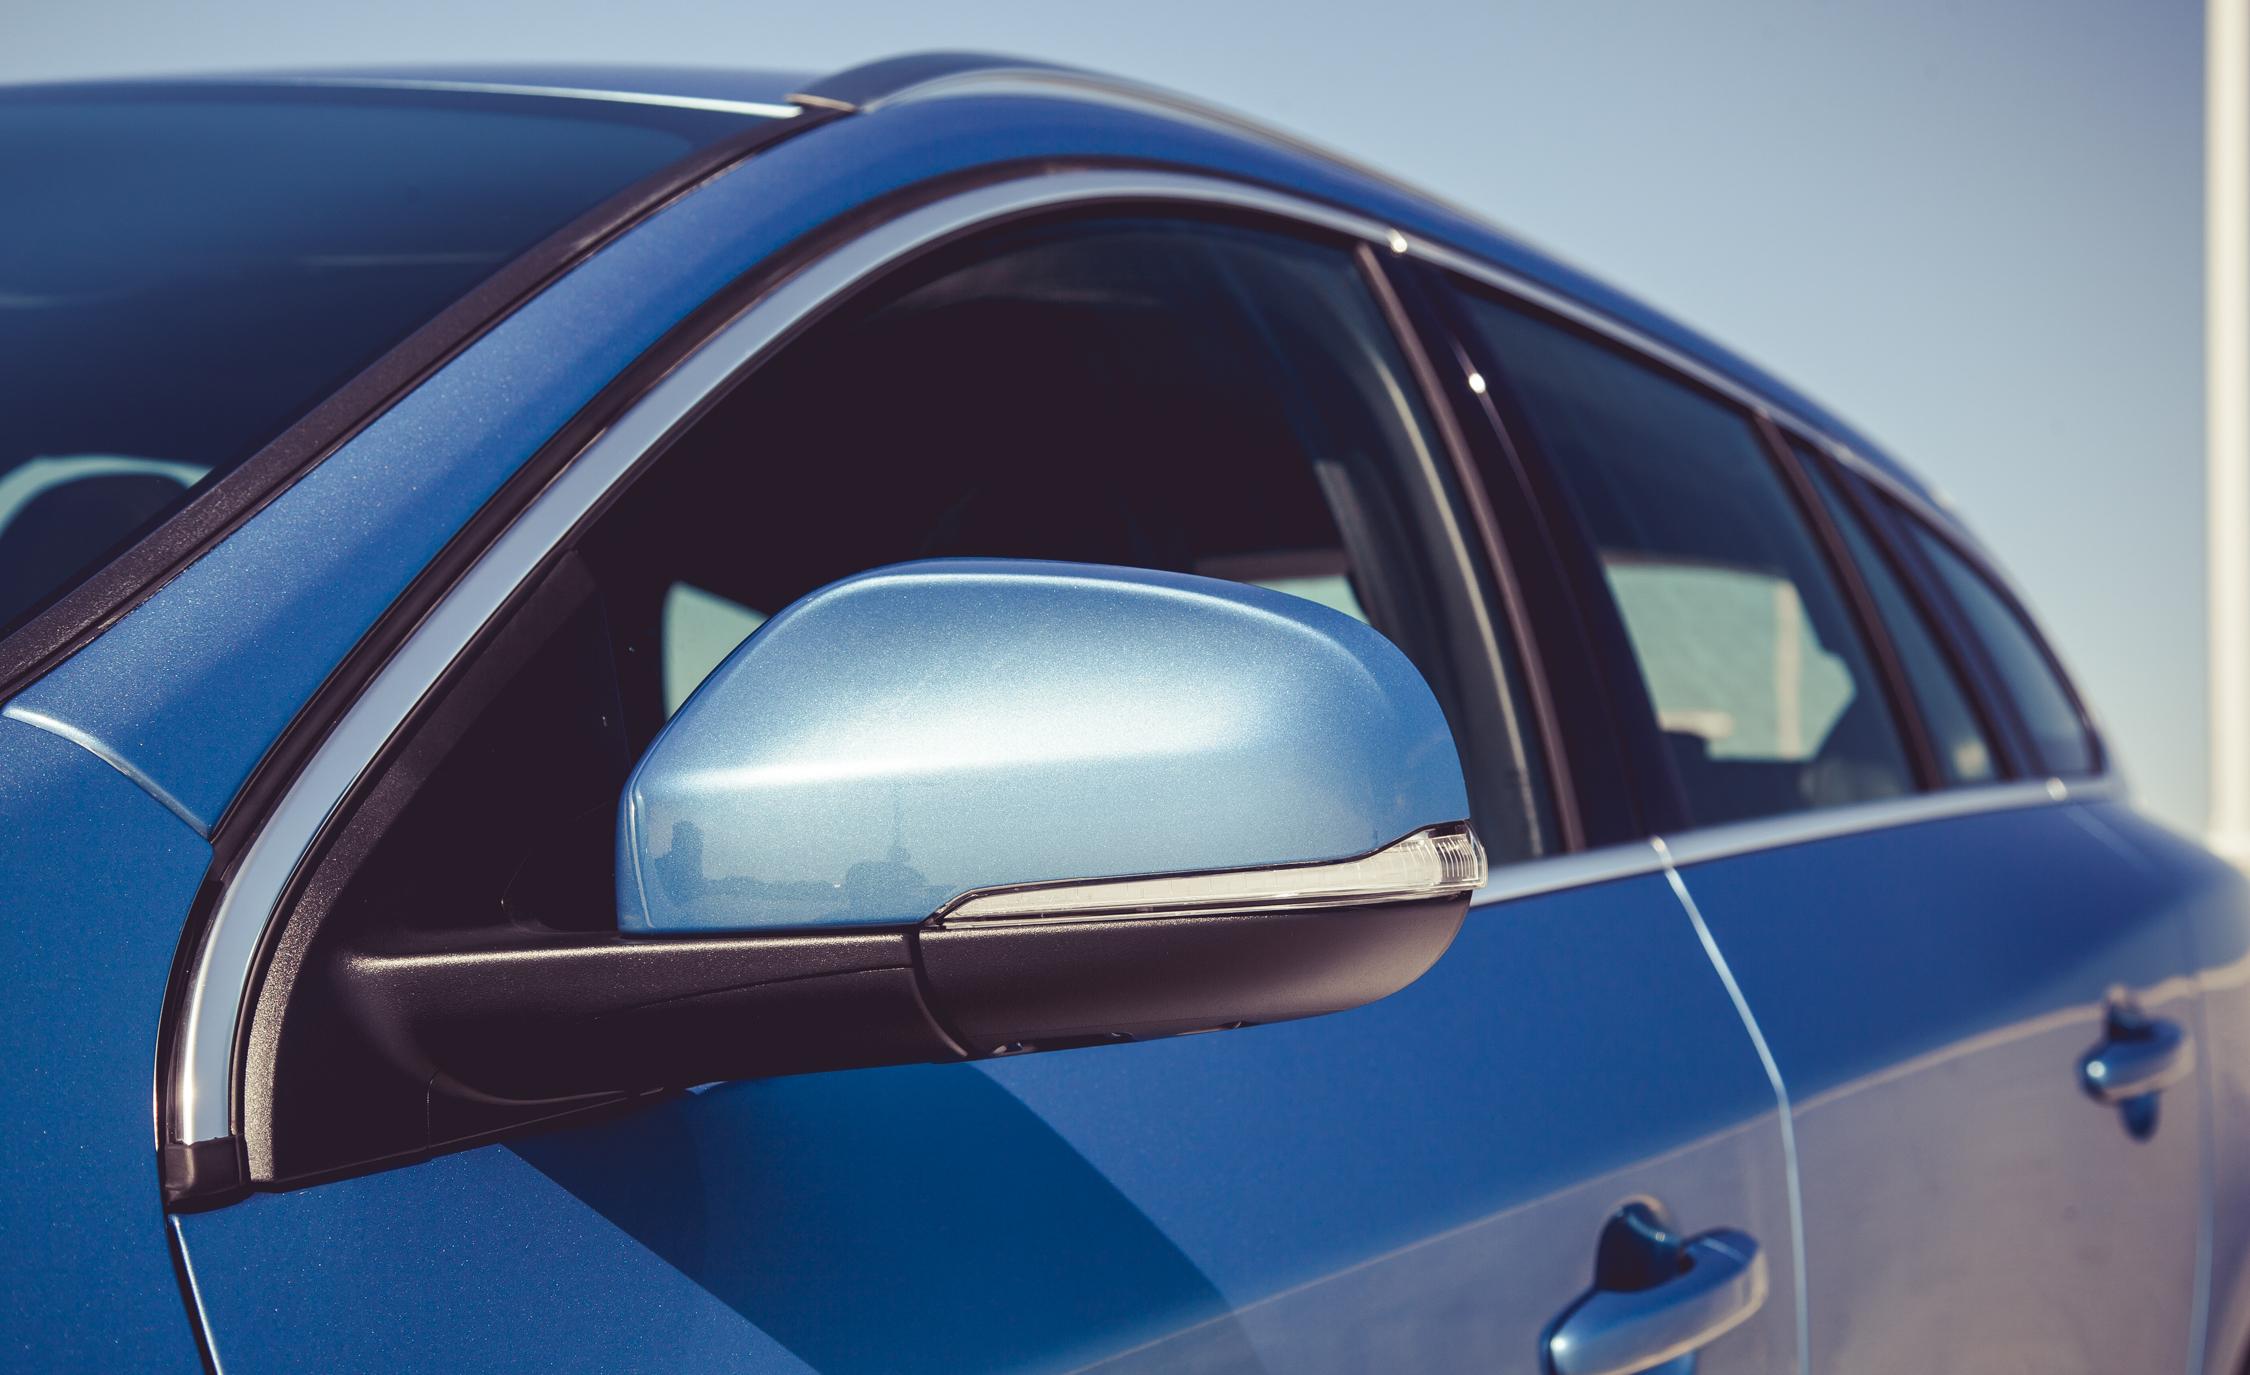 2015 Volvo V60 Exterior Side-View Mirror